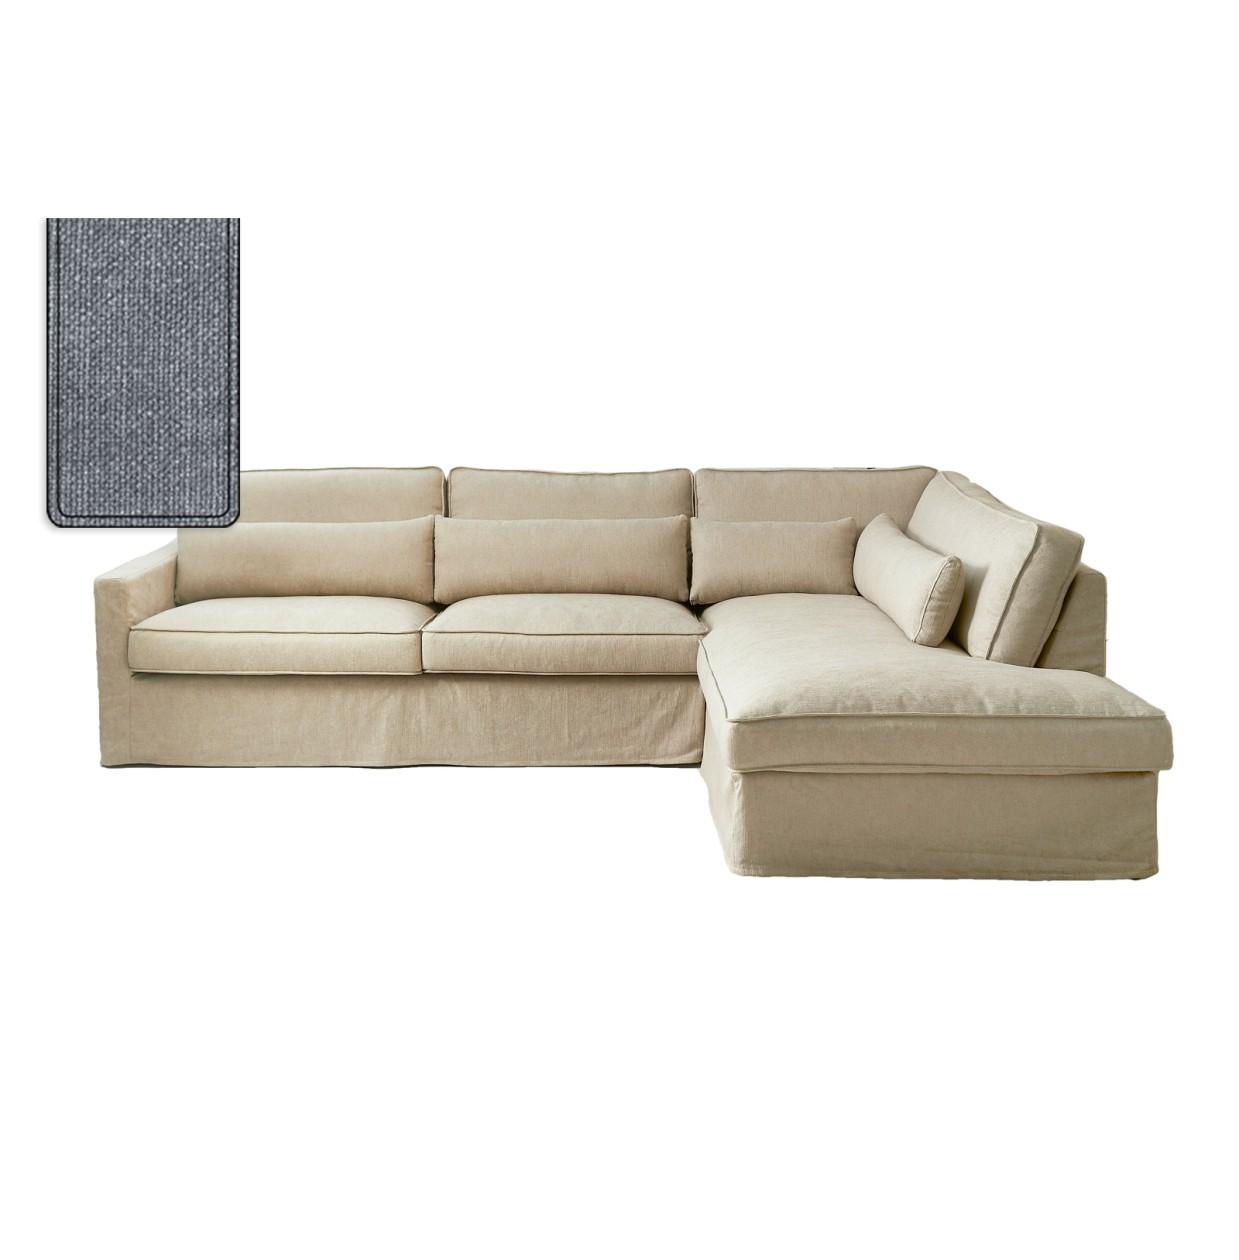 Brompton Cross Corner Sofa Chaise Longue Right Washed Cotton Blue / Rivièra Maison